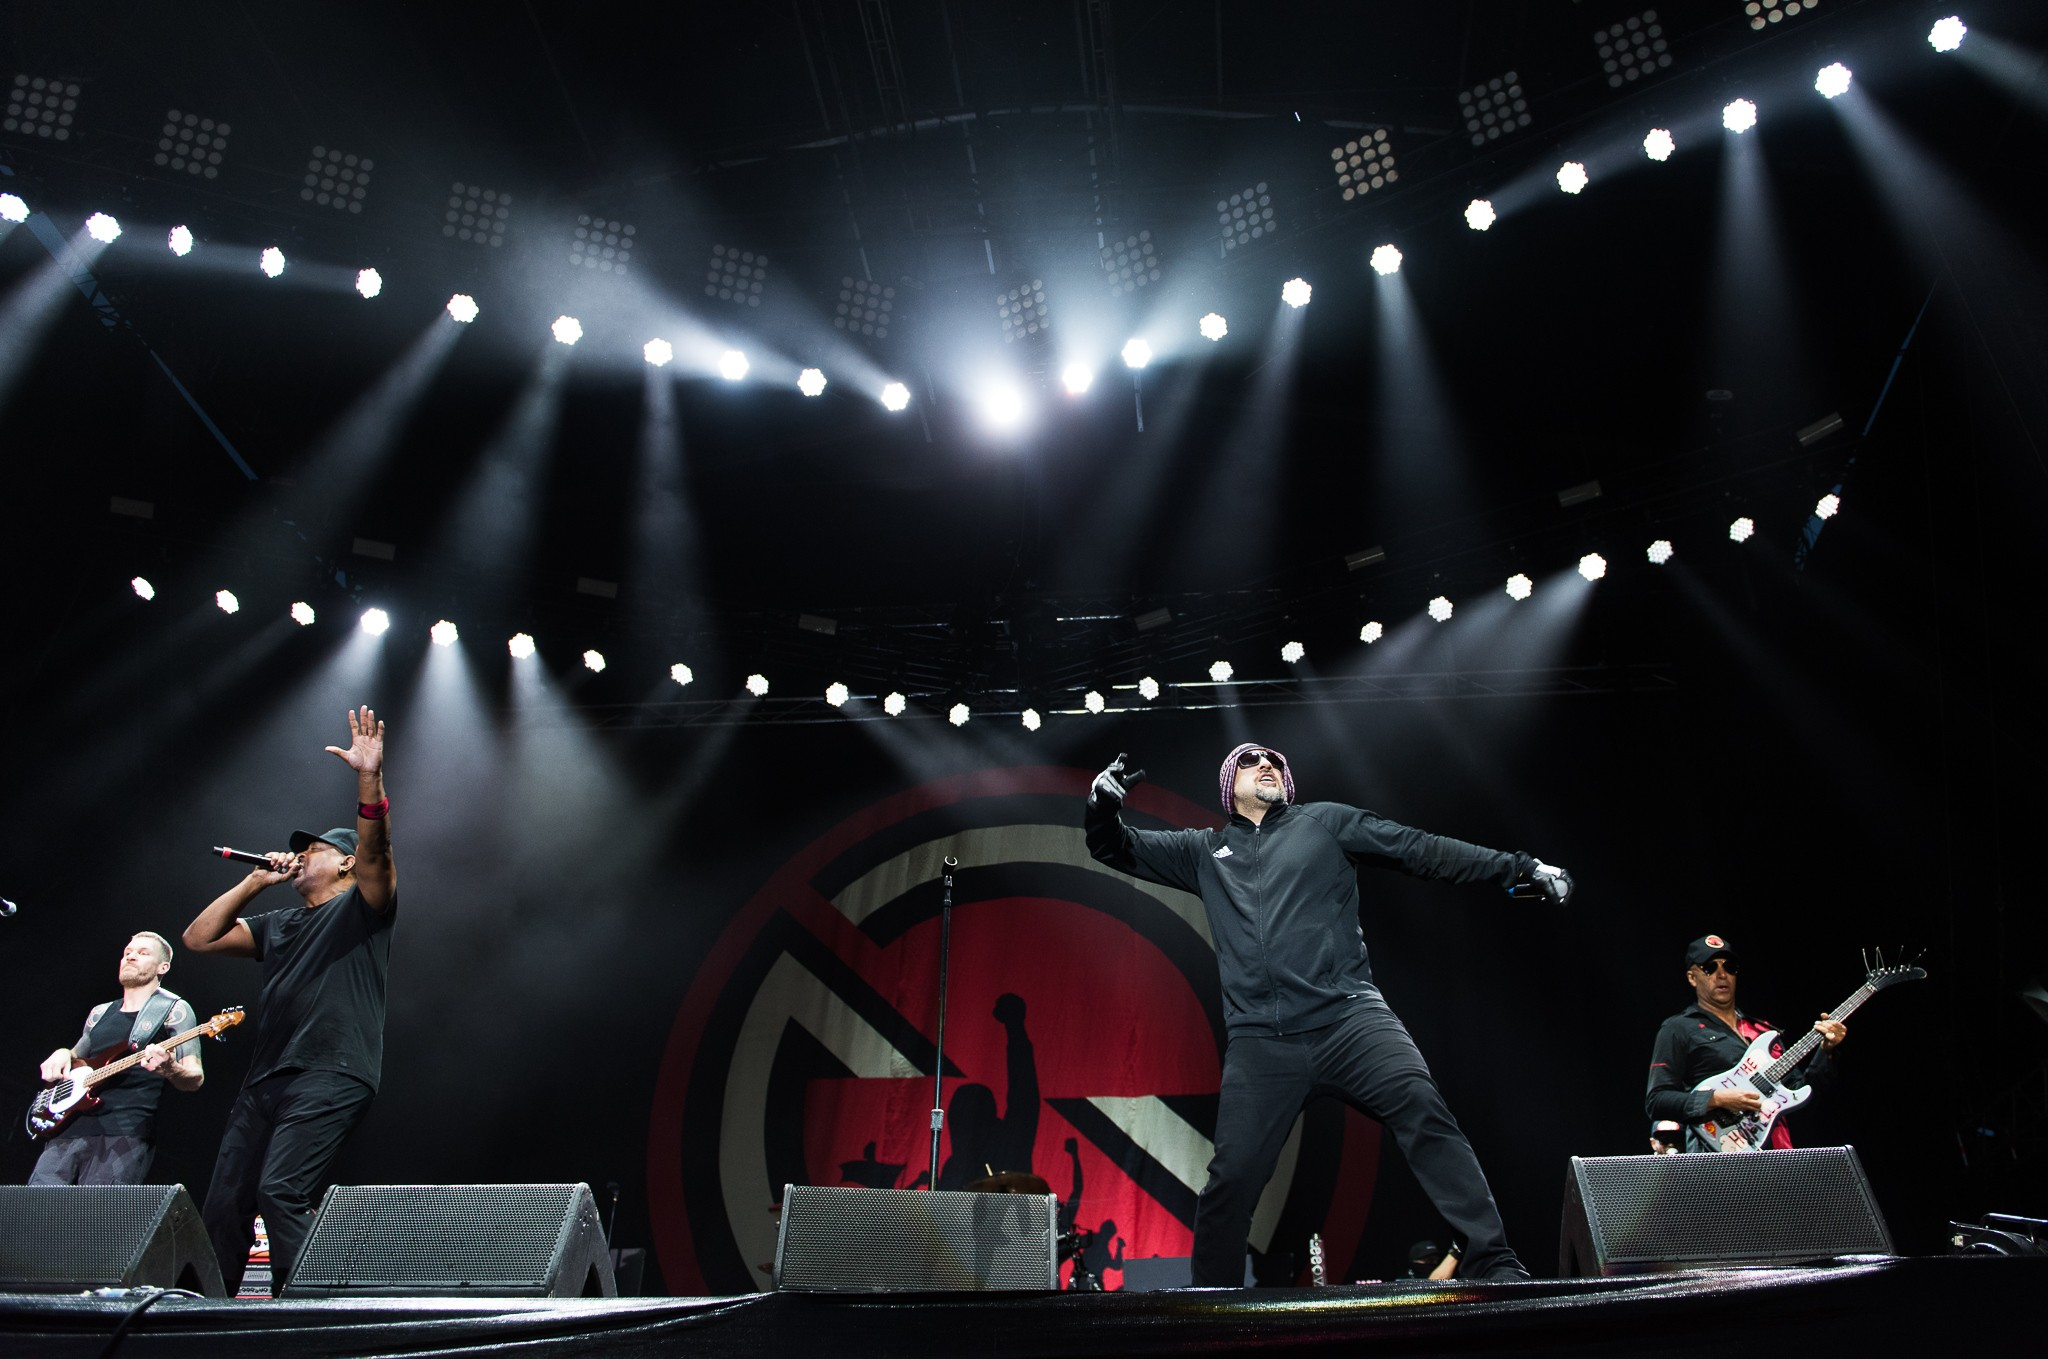 Prophets of Rage at 2018 Download Festival Australia